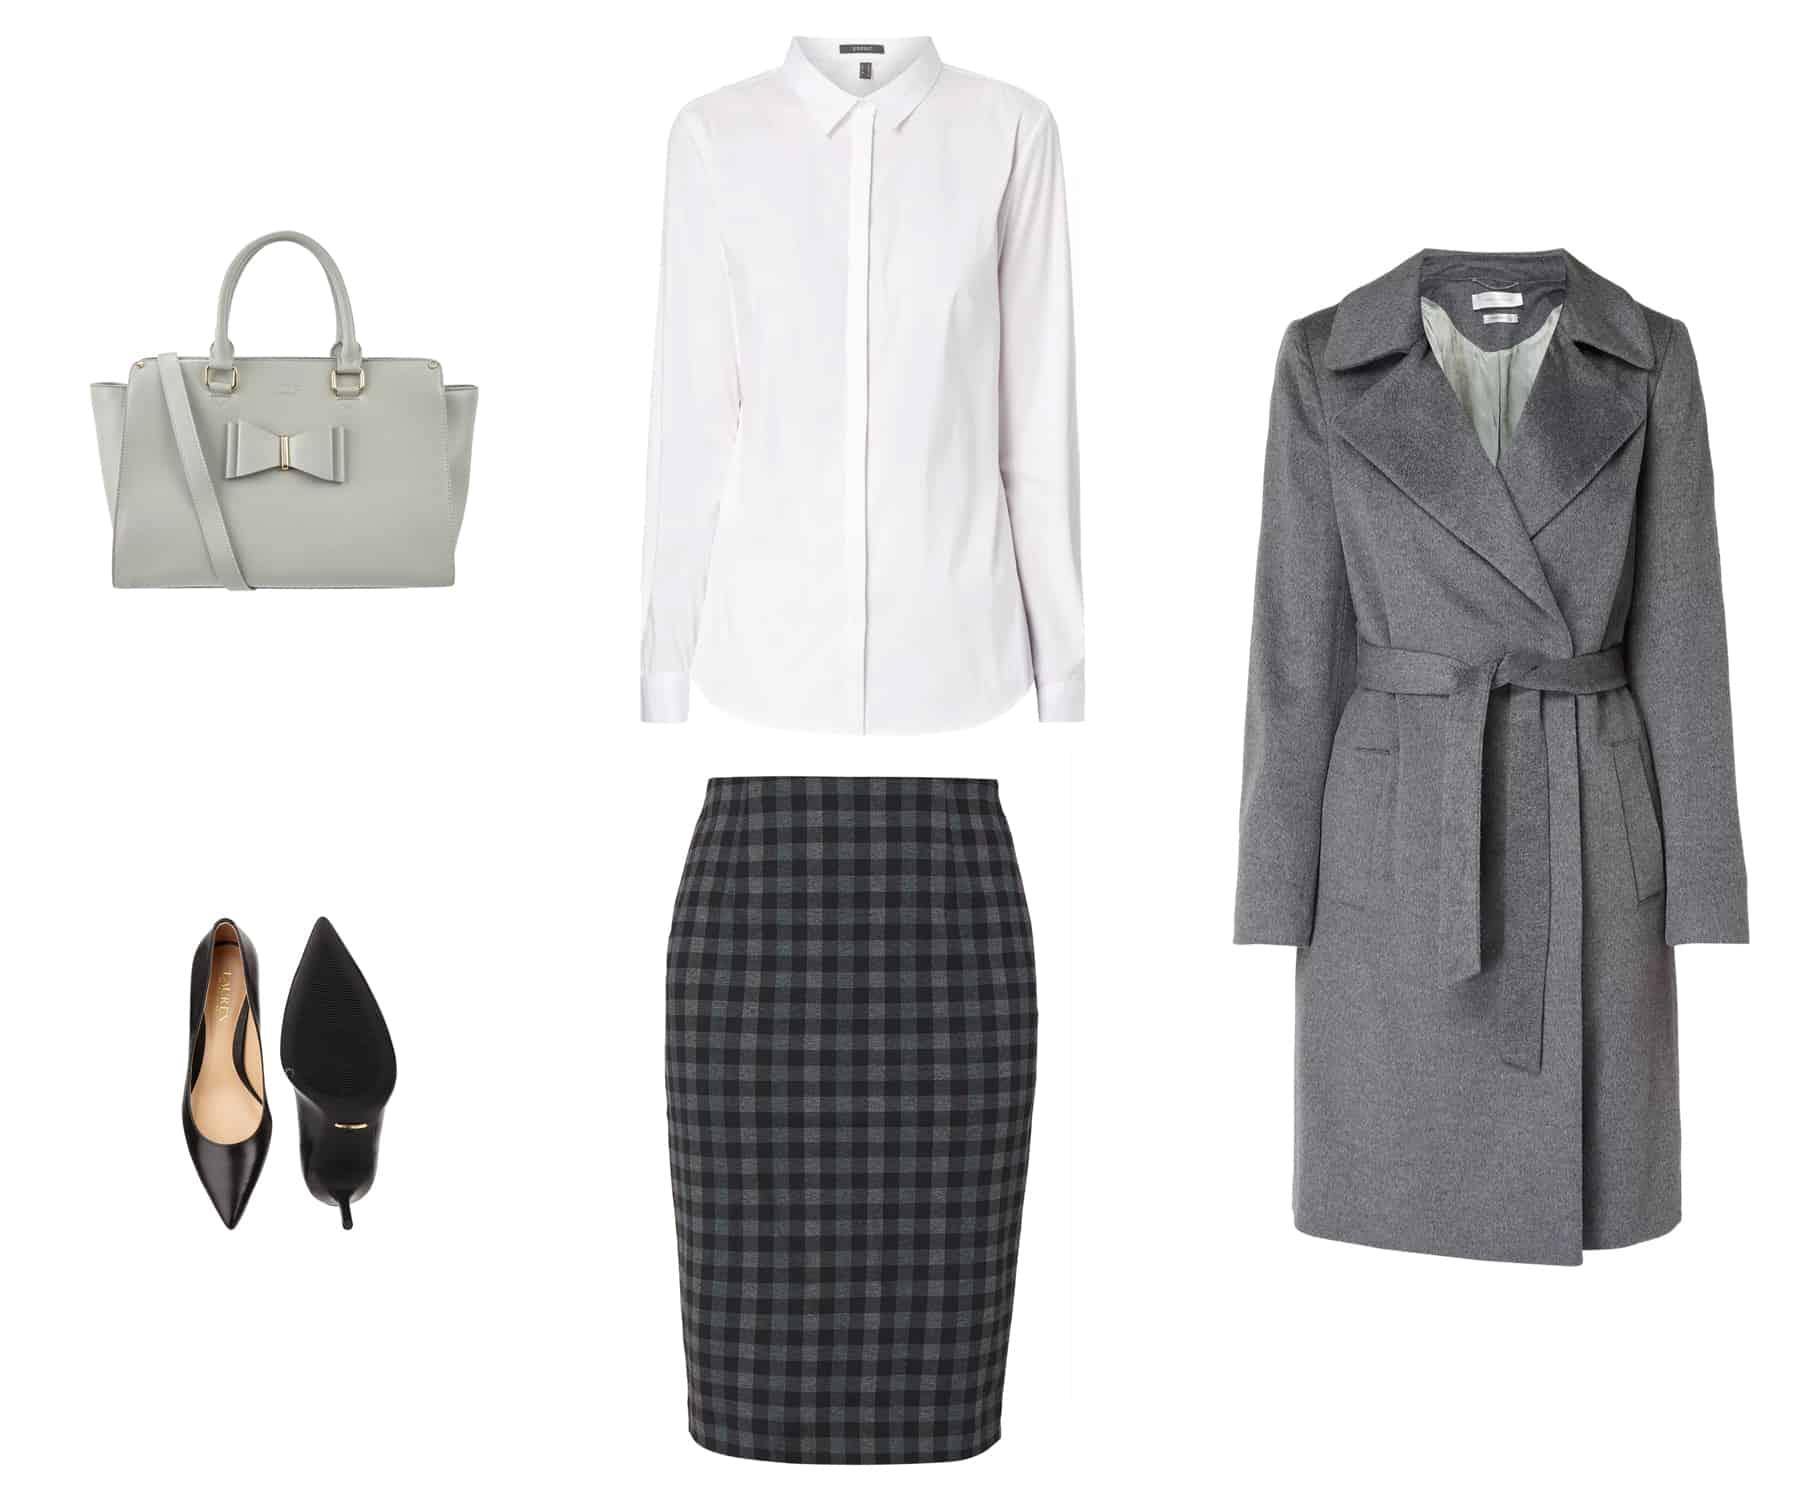 fall fashion - gray buttoned coat, checkered pencil skirt vichy, black pumps, high heels, gray handbag